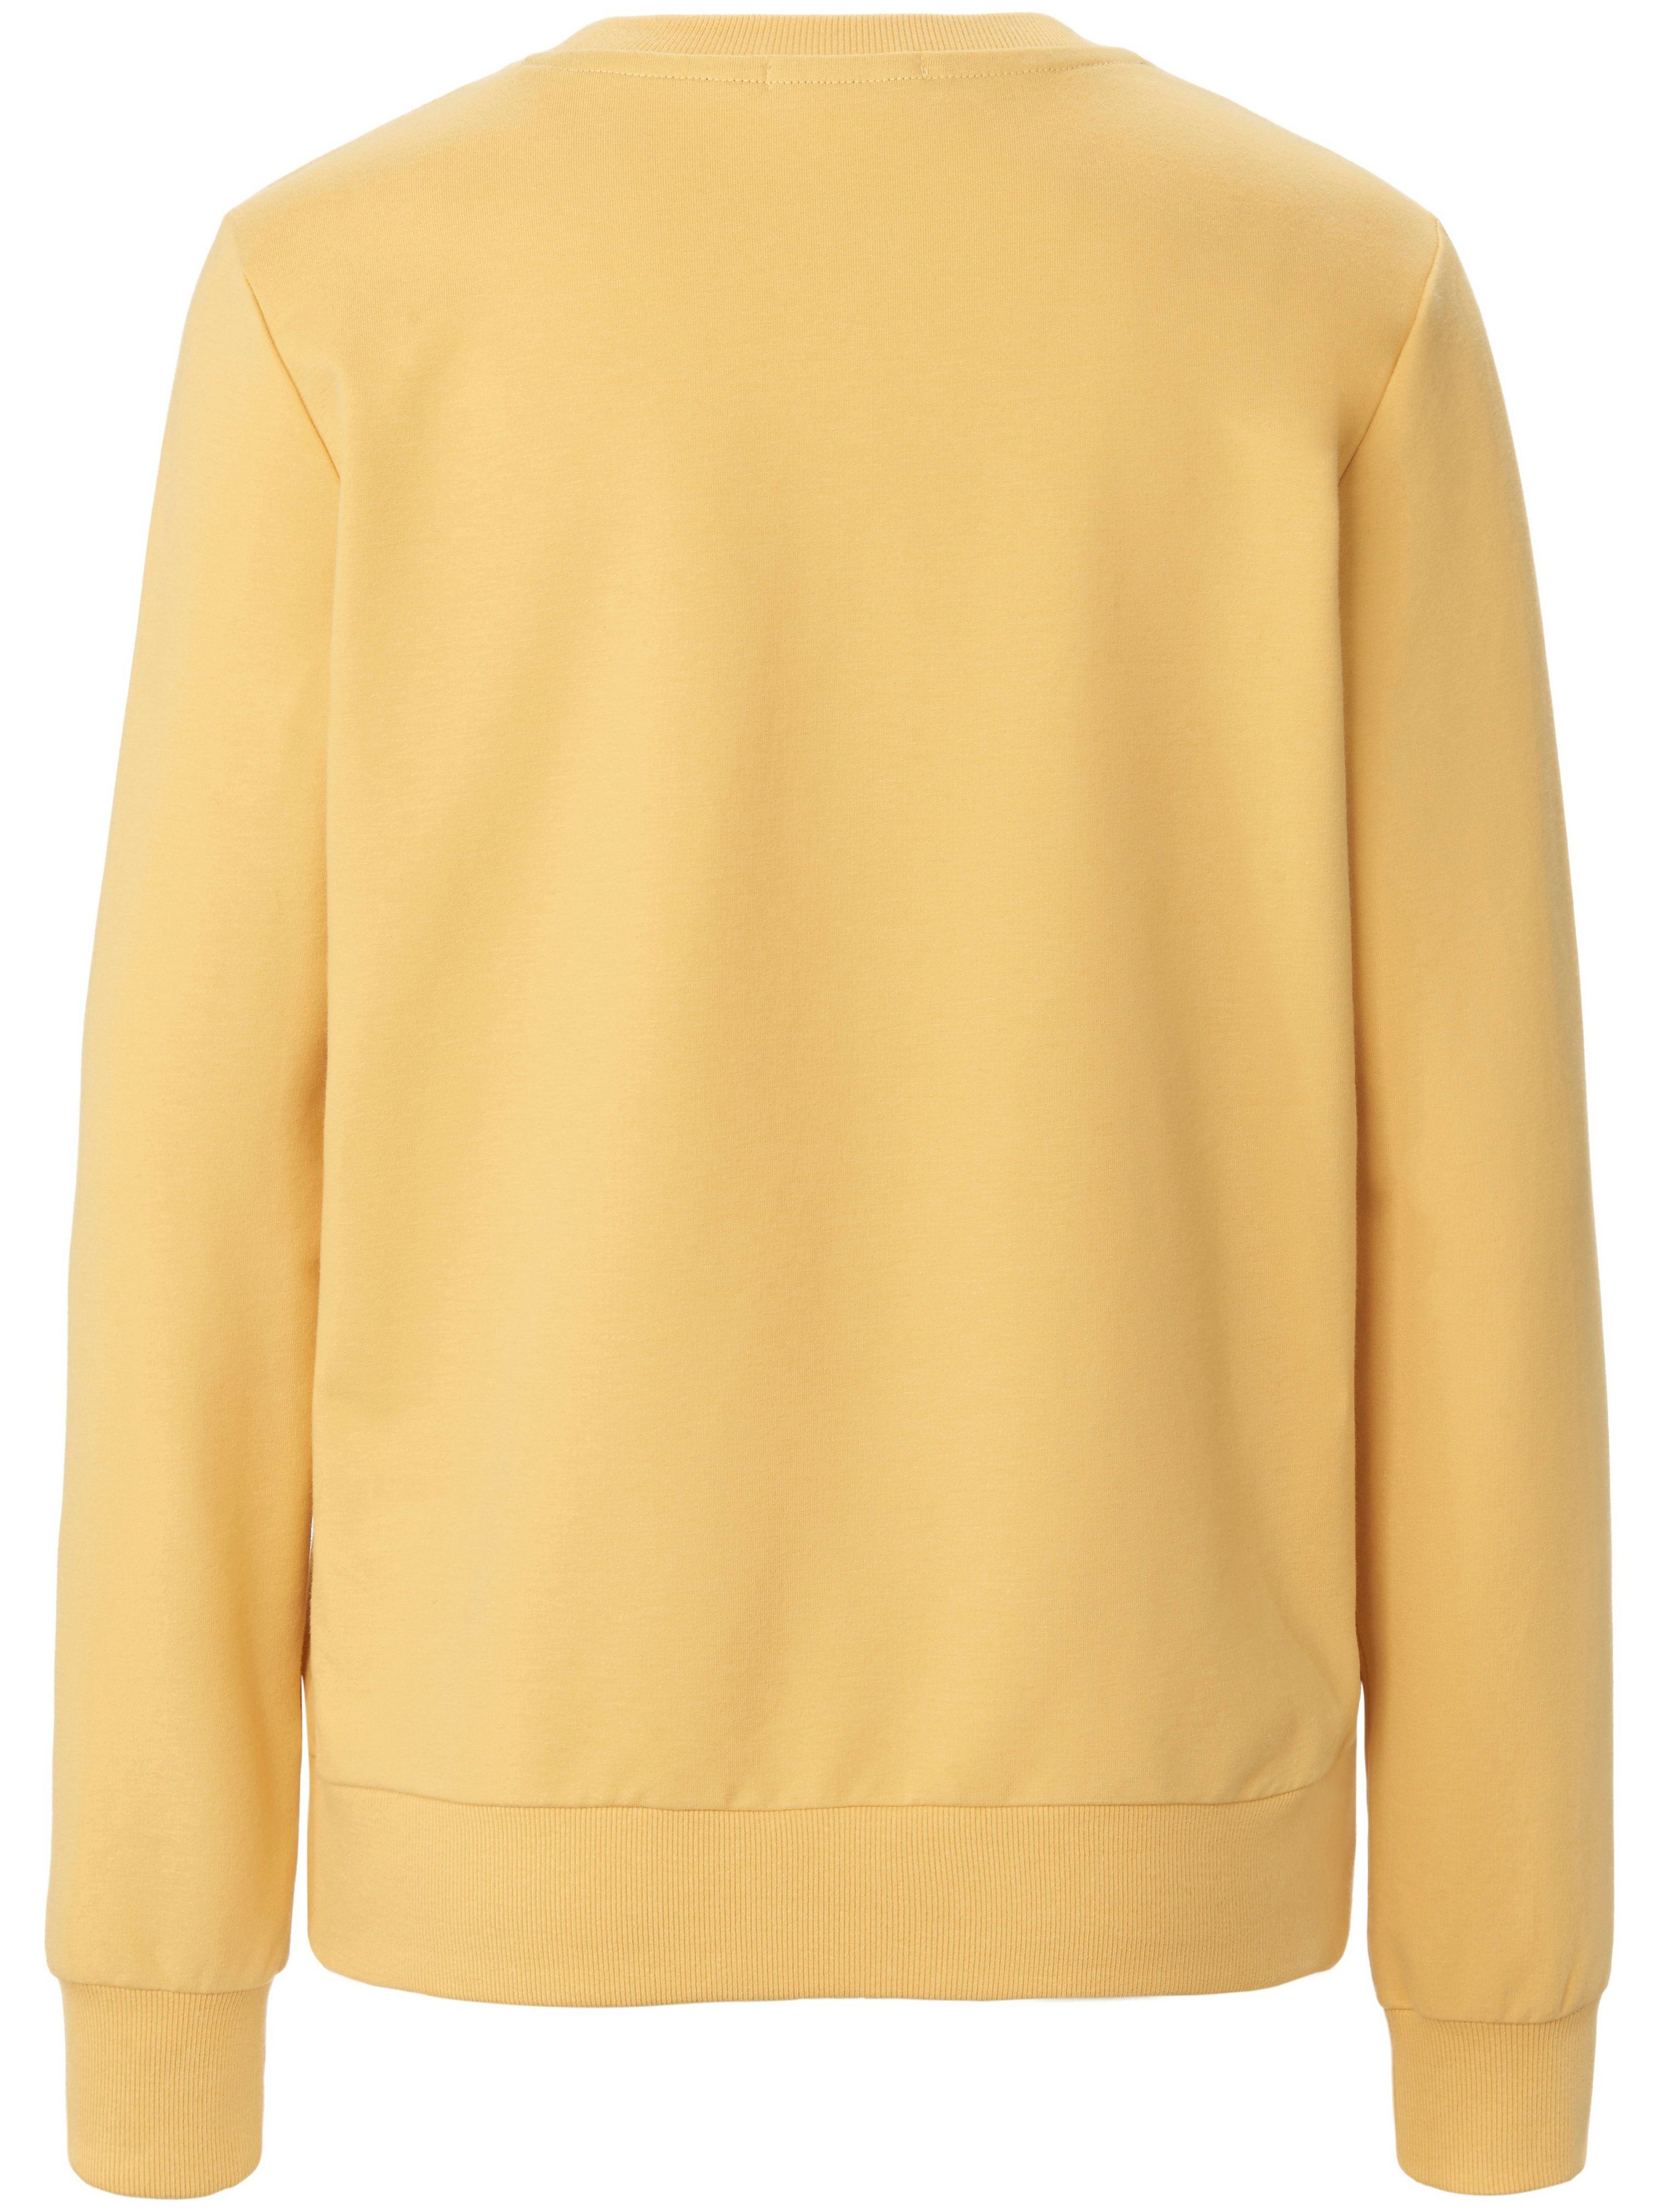 Sweatshirt lange ærmer Fra Mey gul